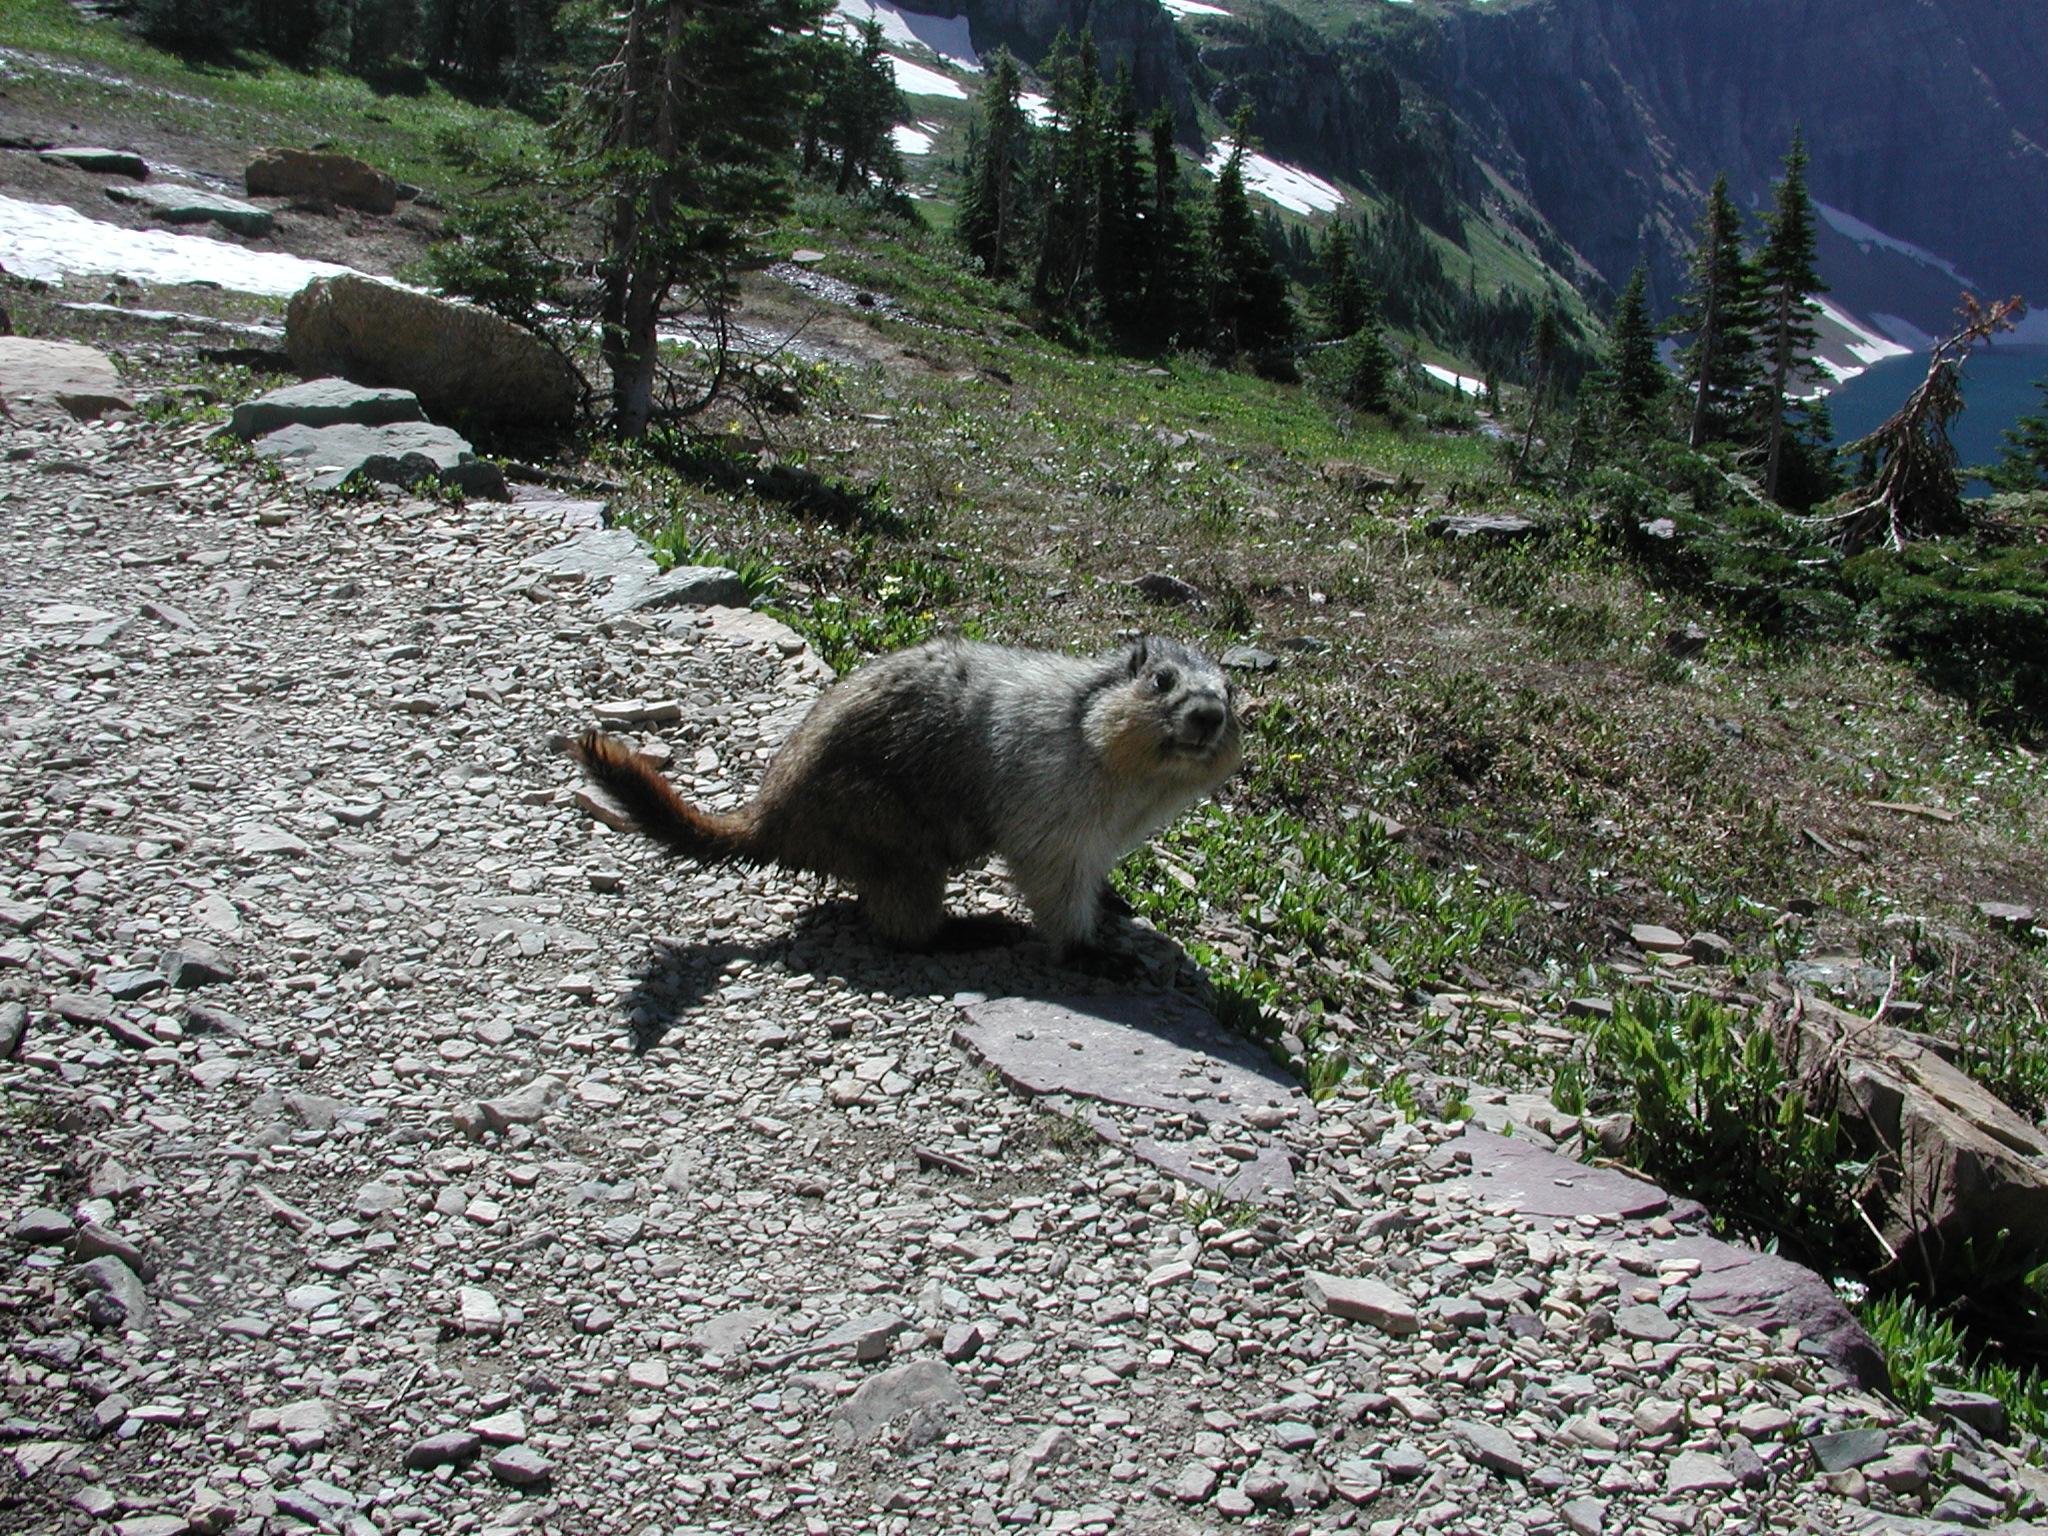 Marmot, coatimundi